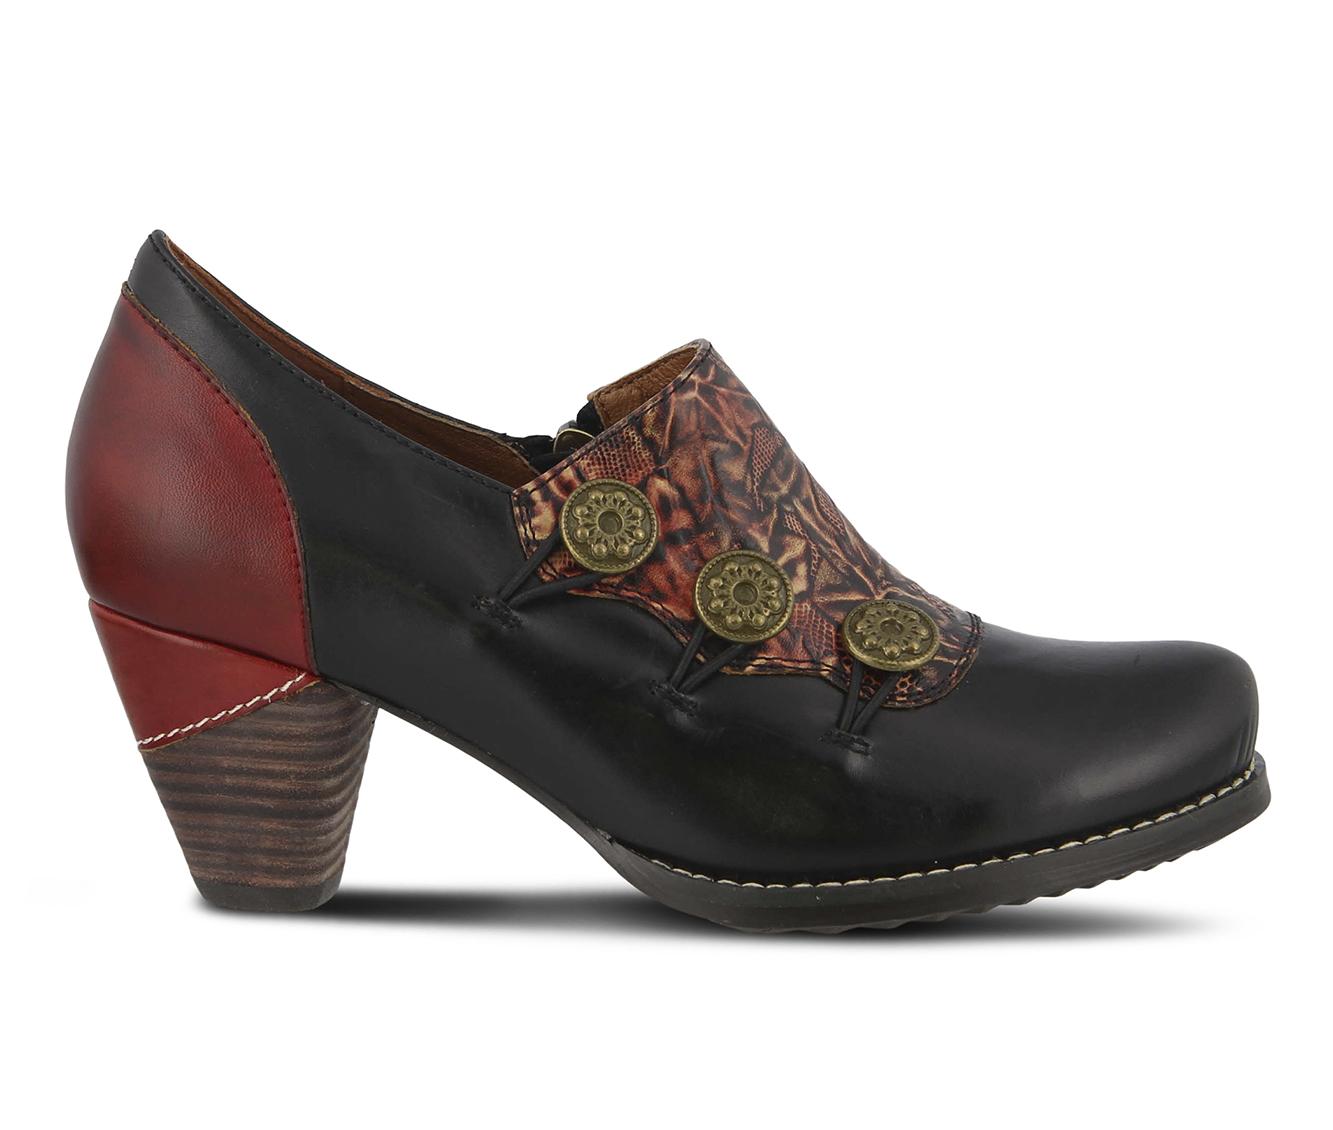 L'Artiste Kantia Women's Dress Shoe (Black Leather)